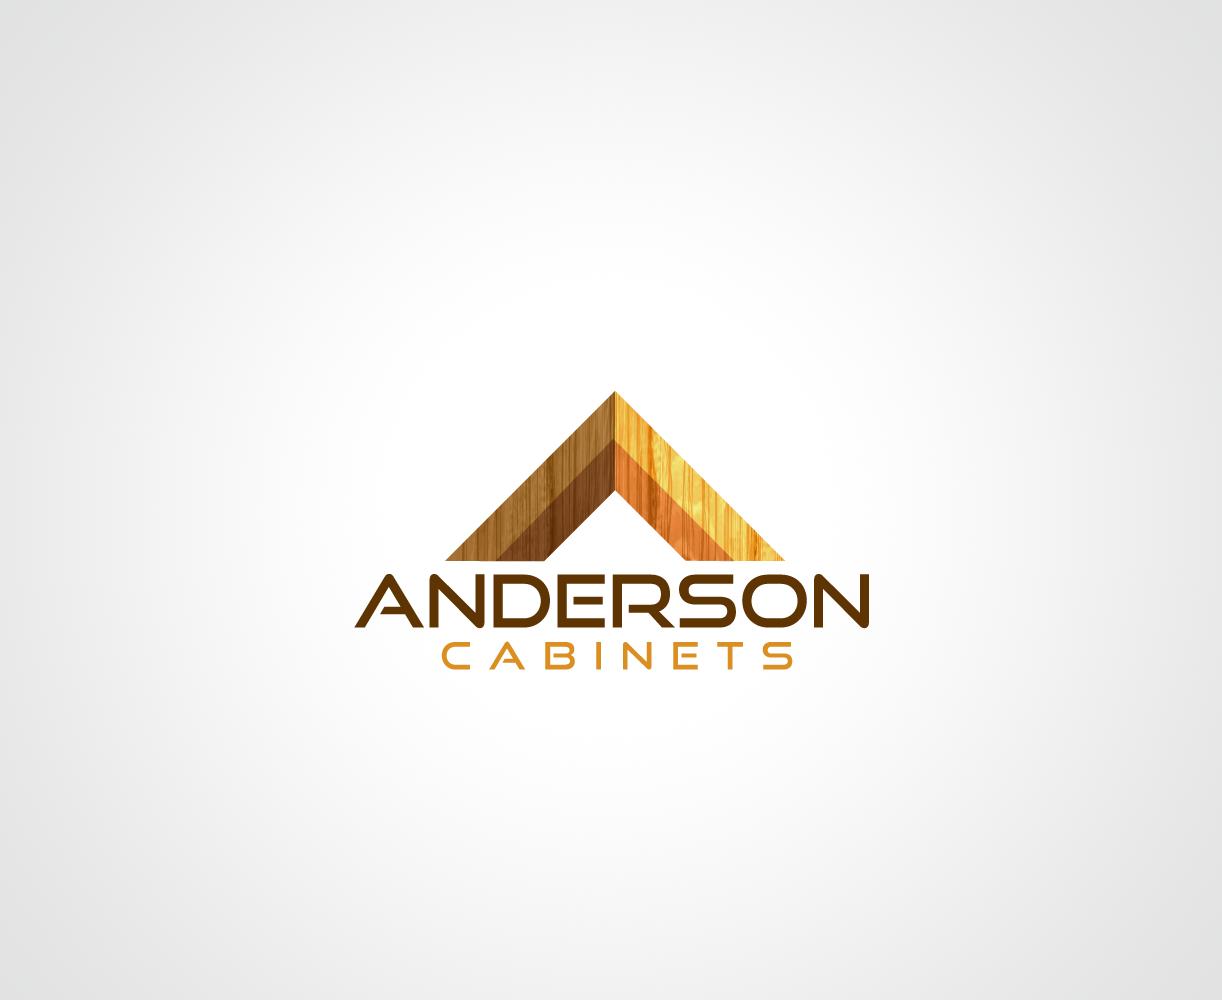 Logo Design By Costur For Anderson Cabinets   Design #17081065